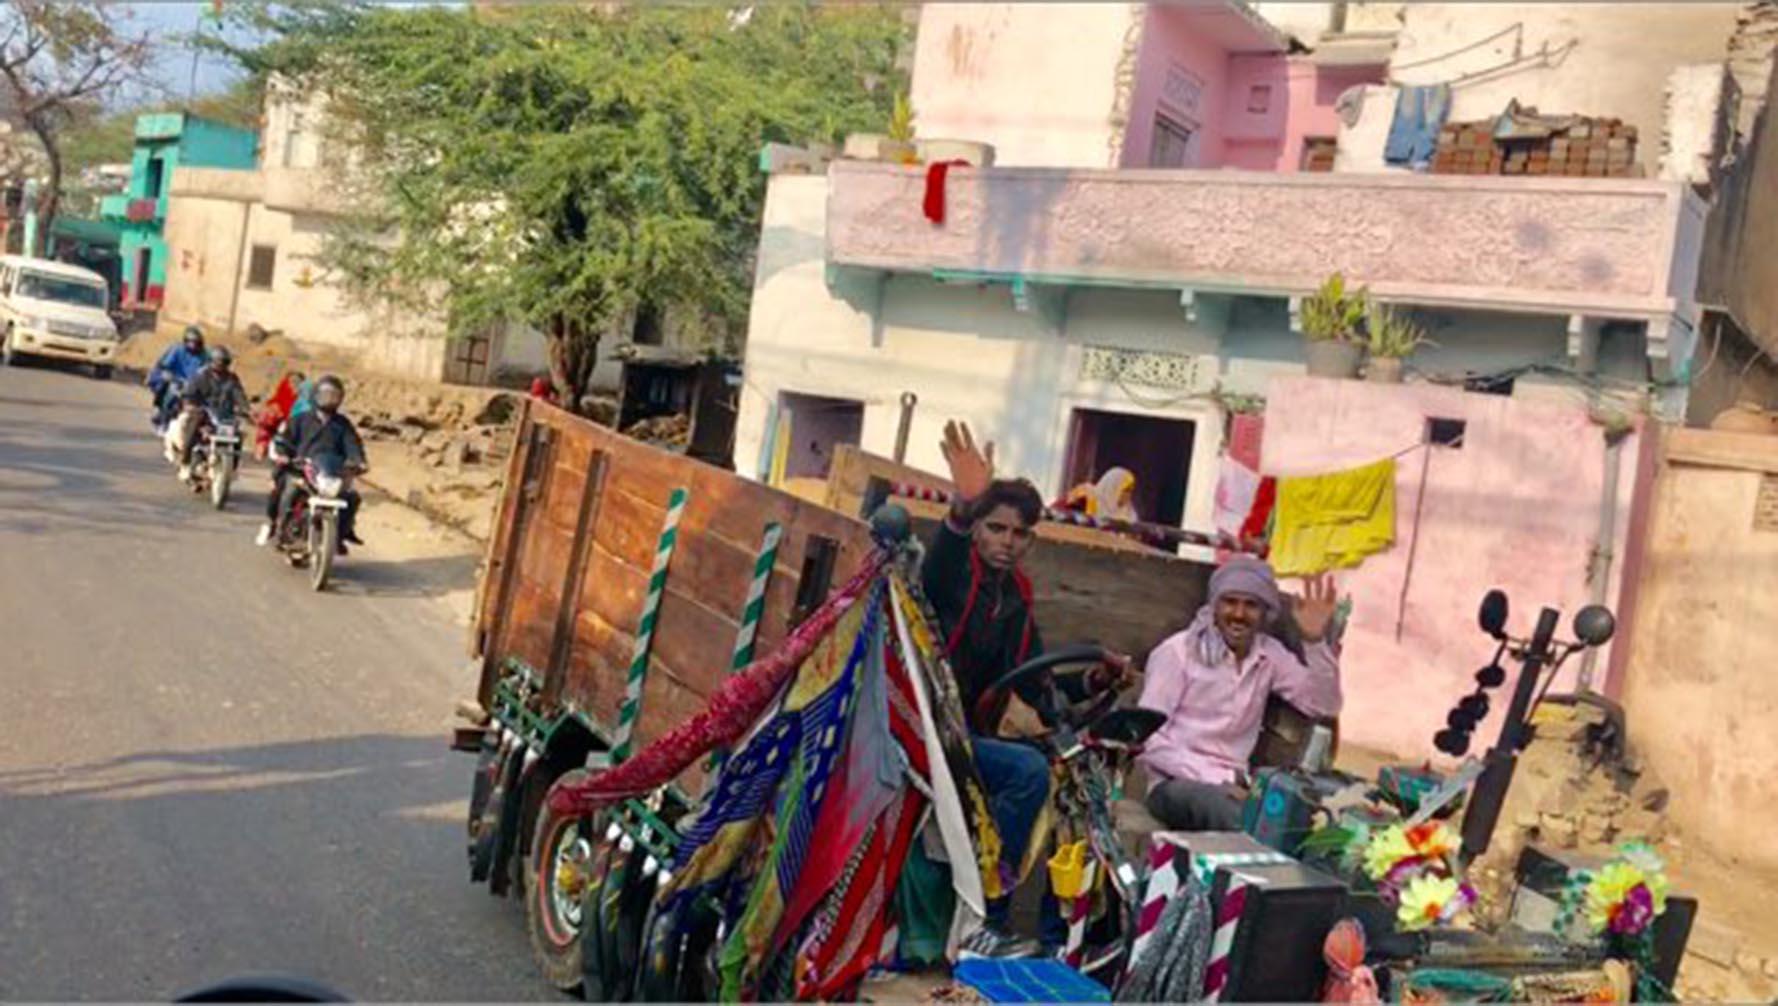 Joyriding in a Jugaad in Rajasthan